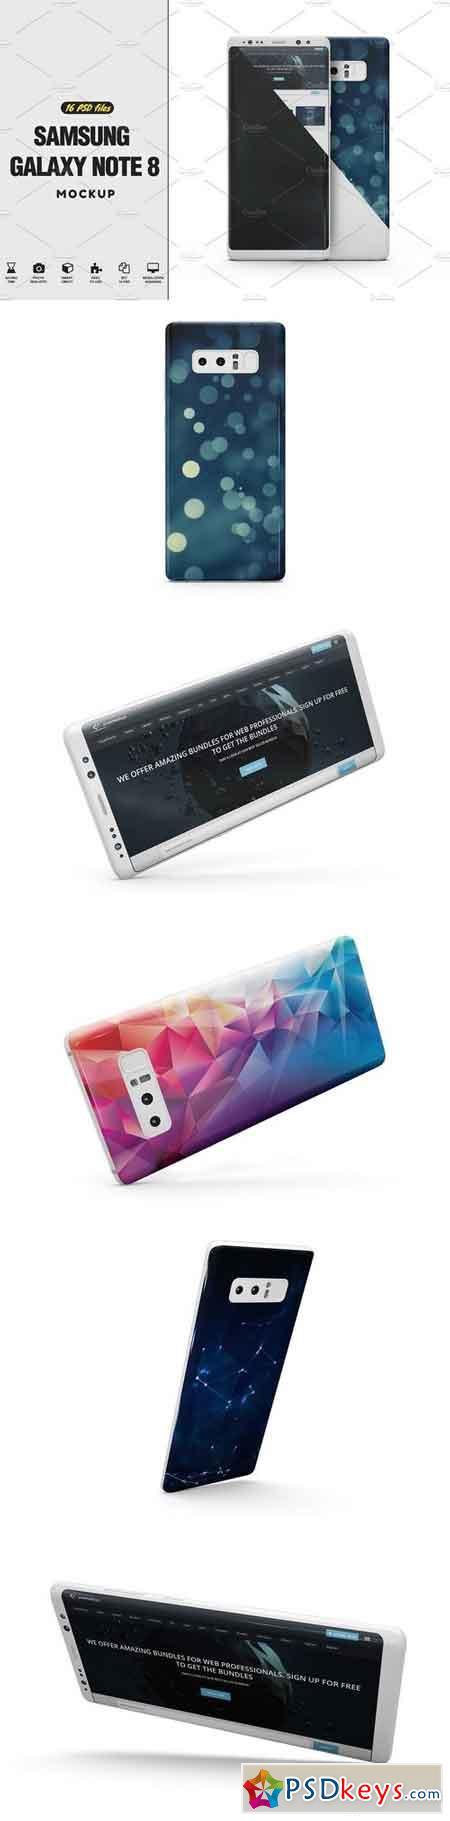 Samsung Galaxy Note 8 Vol.3 Mockup 2133377